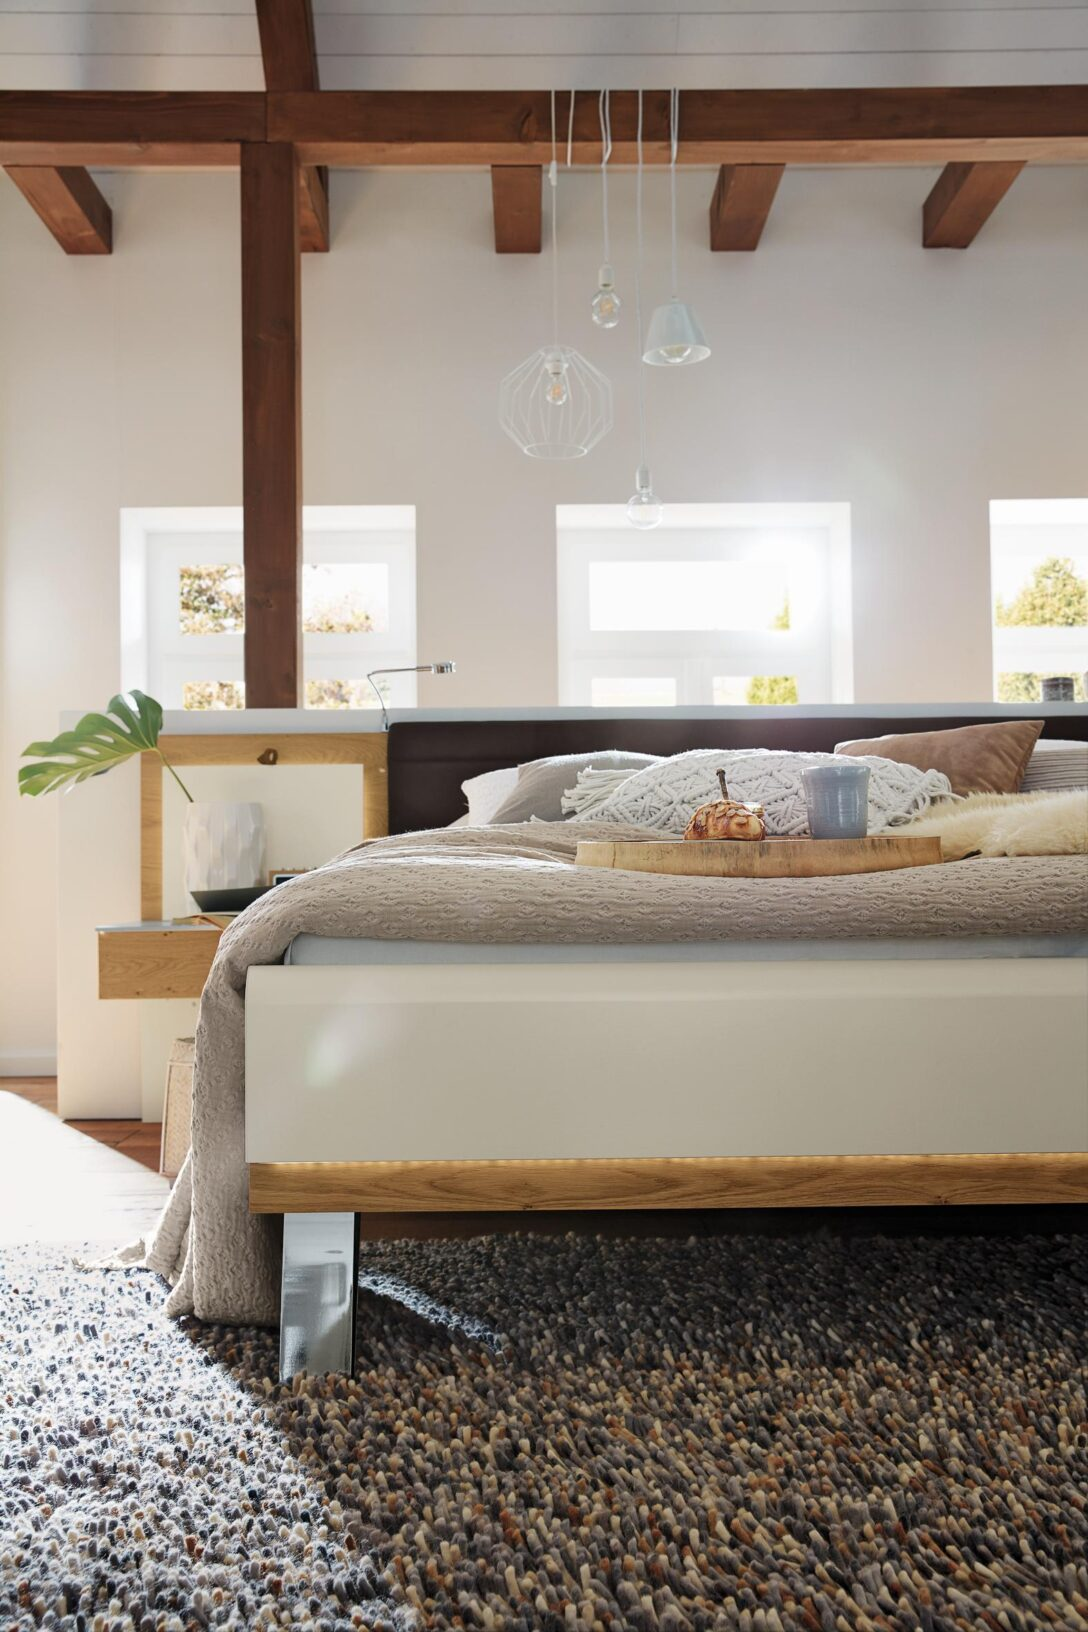 Large Size of Musterring Saphira Esstisch Betten Wohnzimmer Musterring Saphira